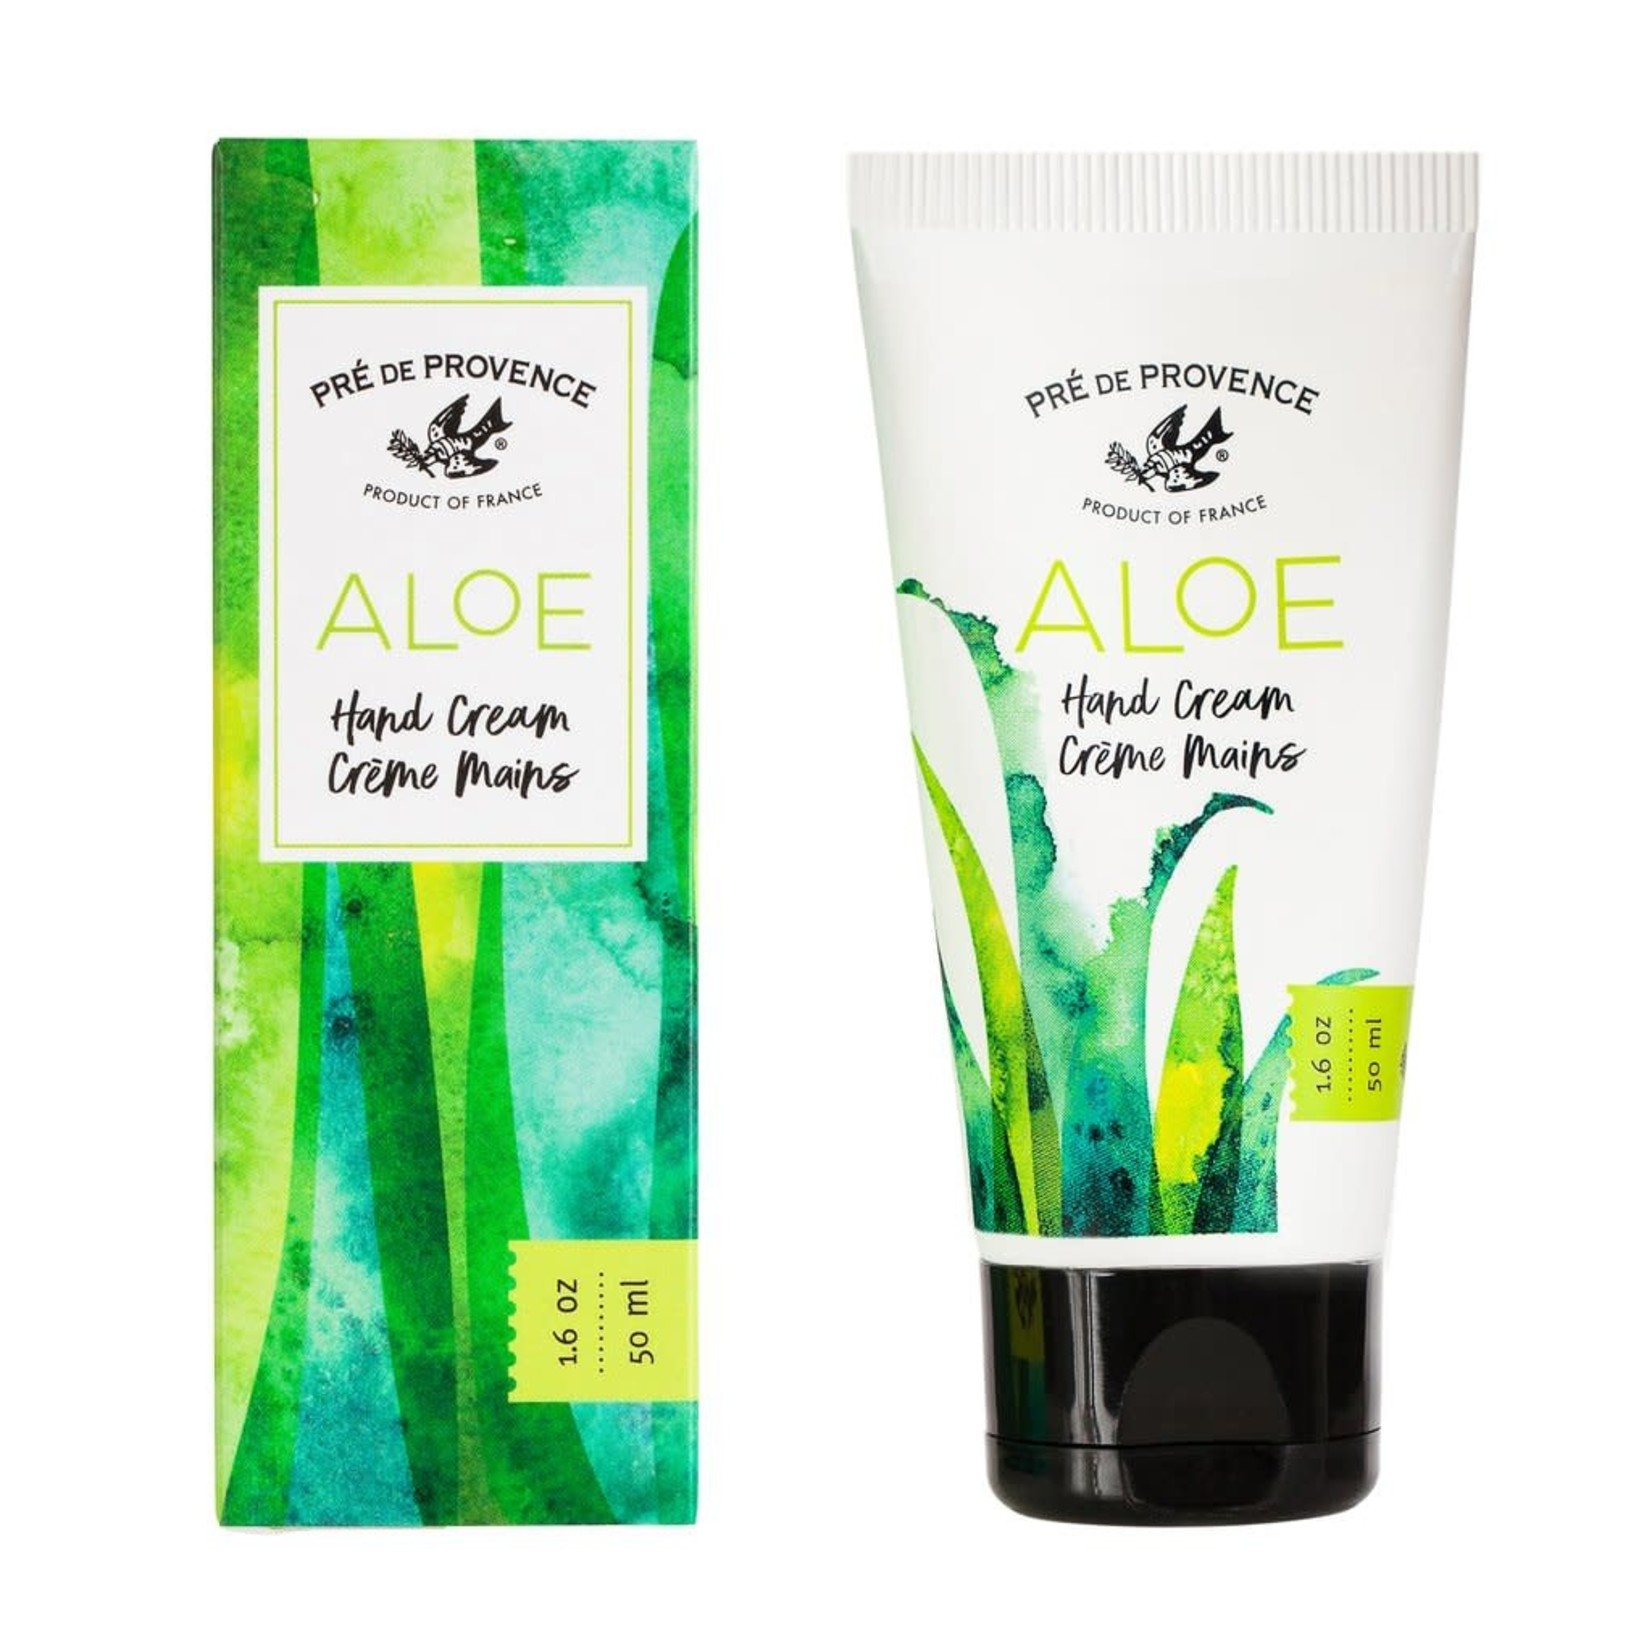 Pre de Provence Aloe Hand Cream 50ml